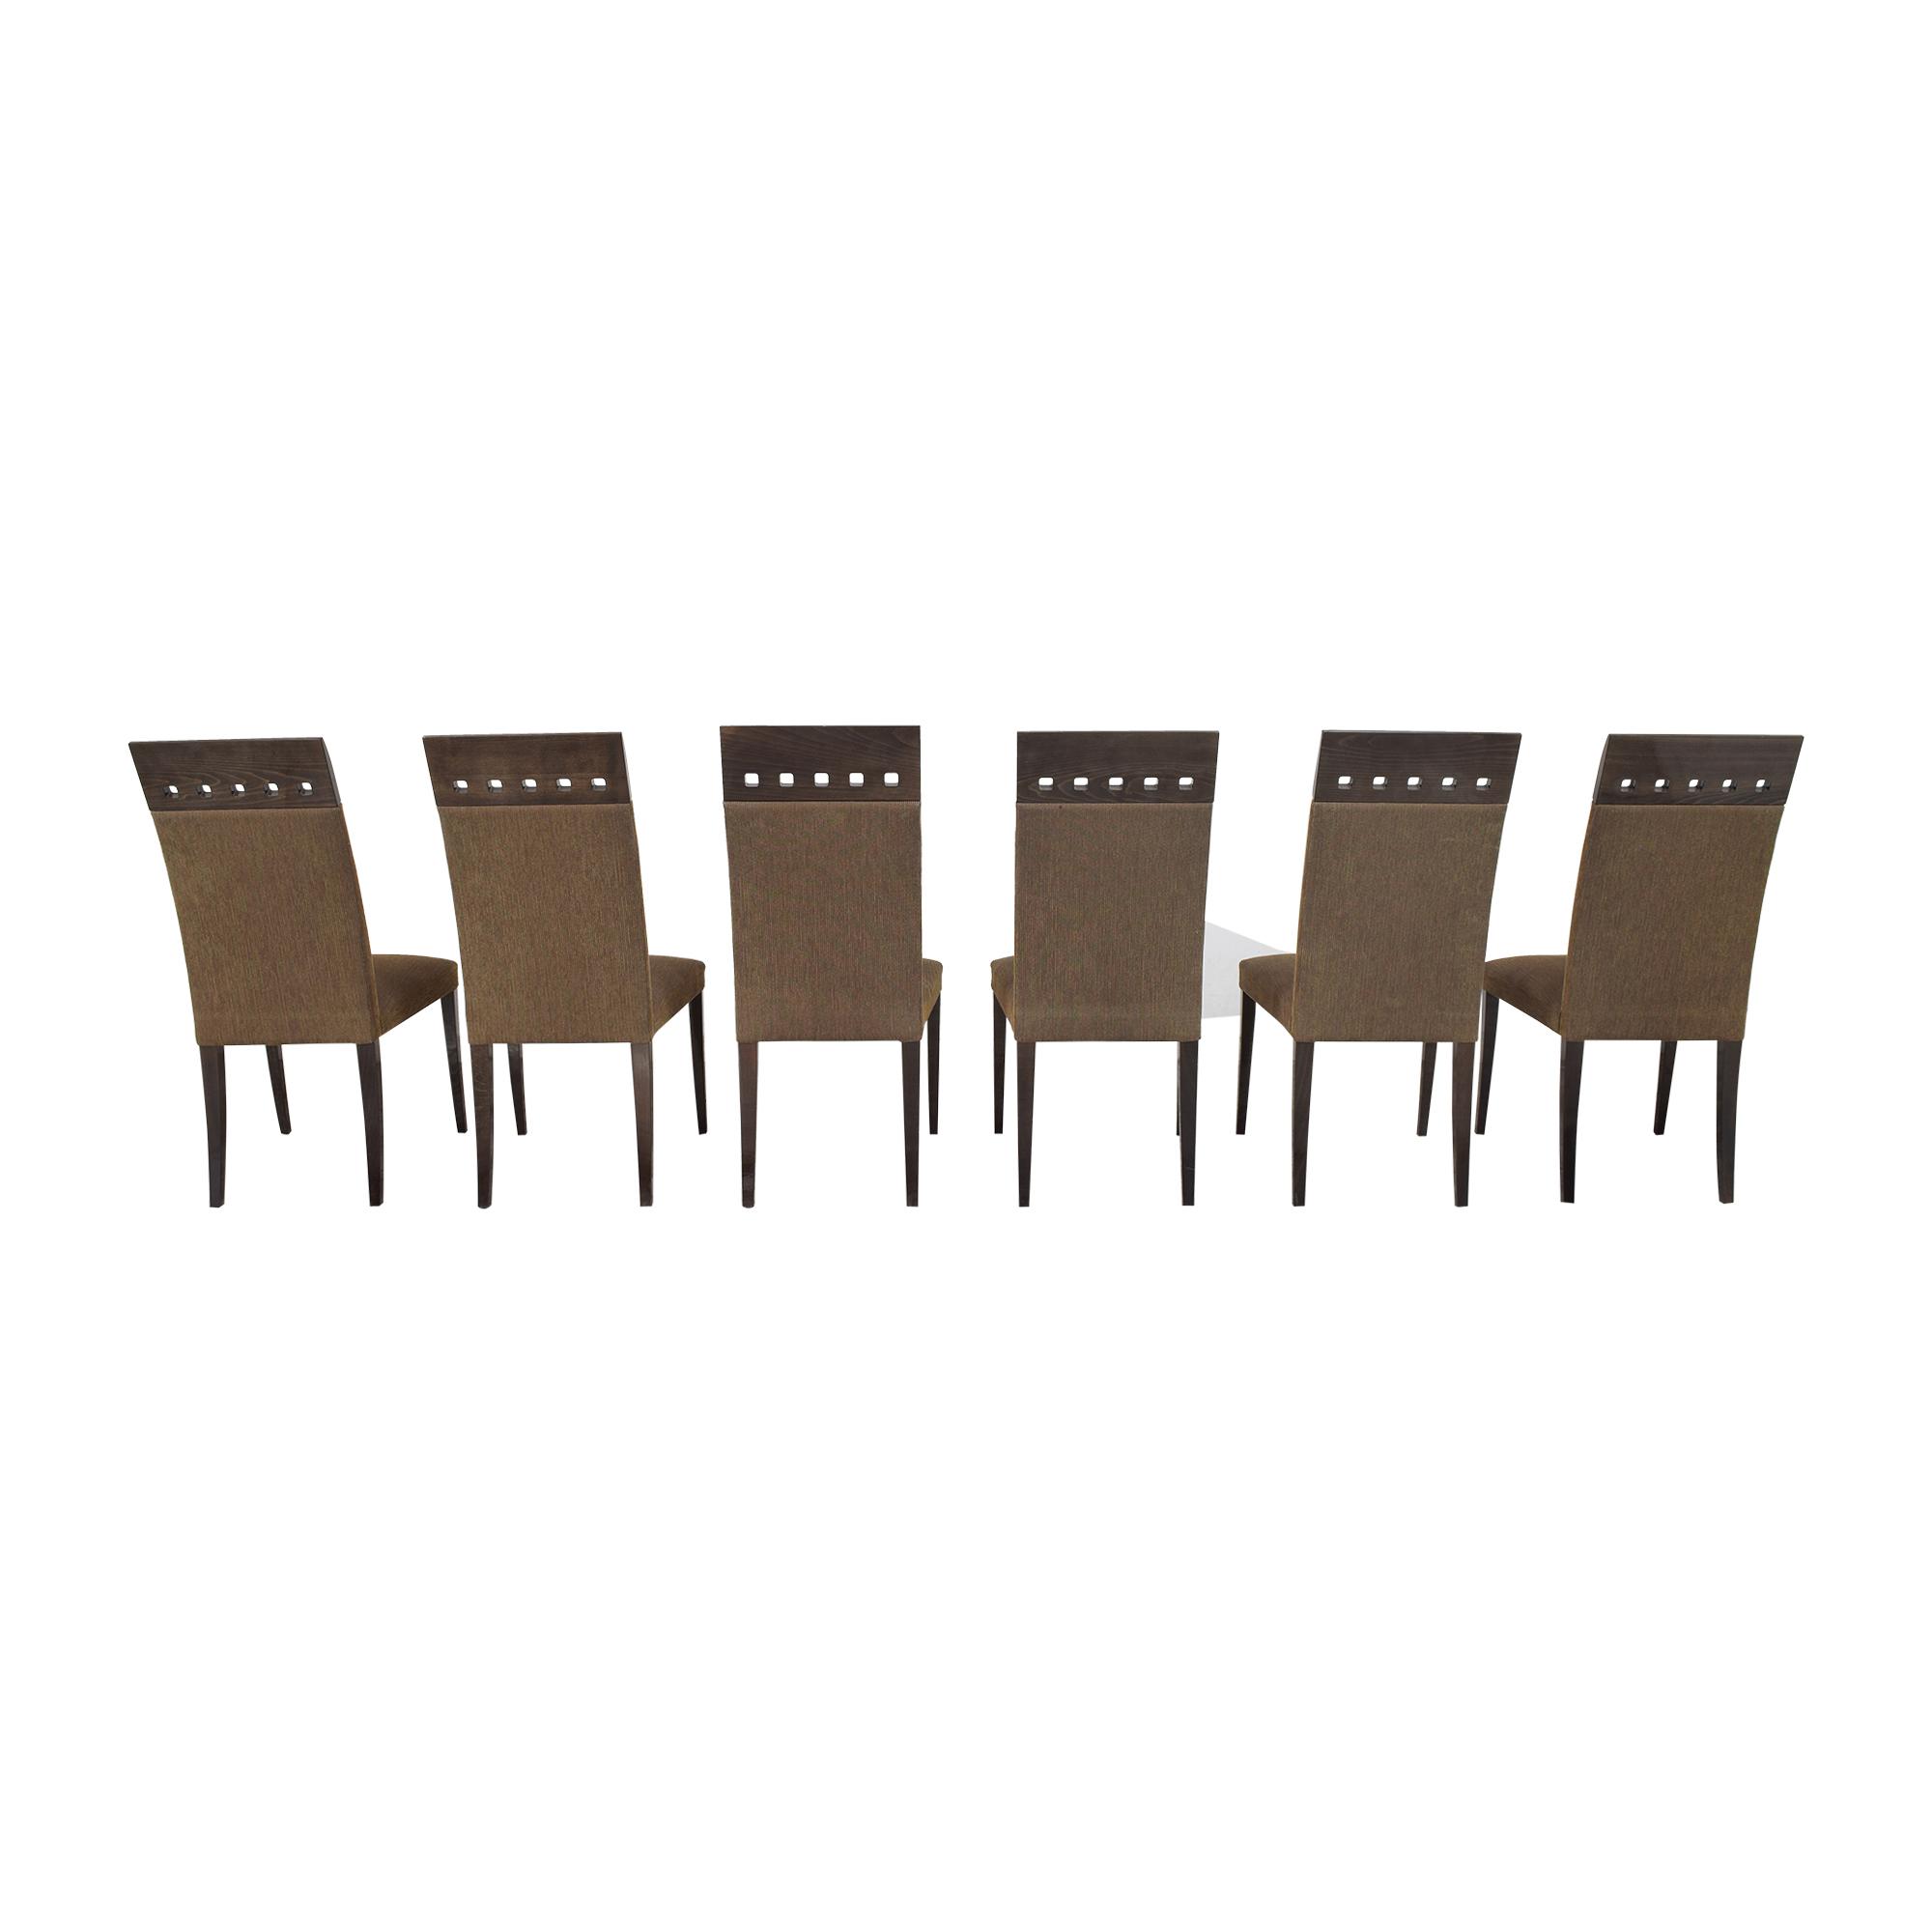 Pietro Costantini Pietro Costantini Waldorf Dining Side Chairs brown